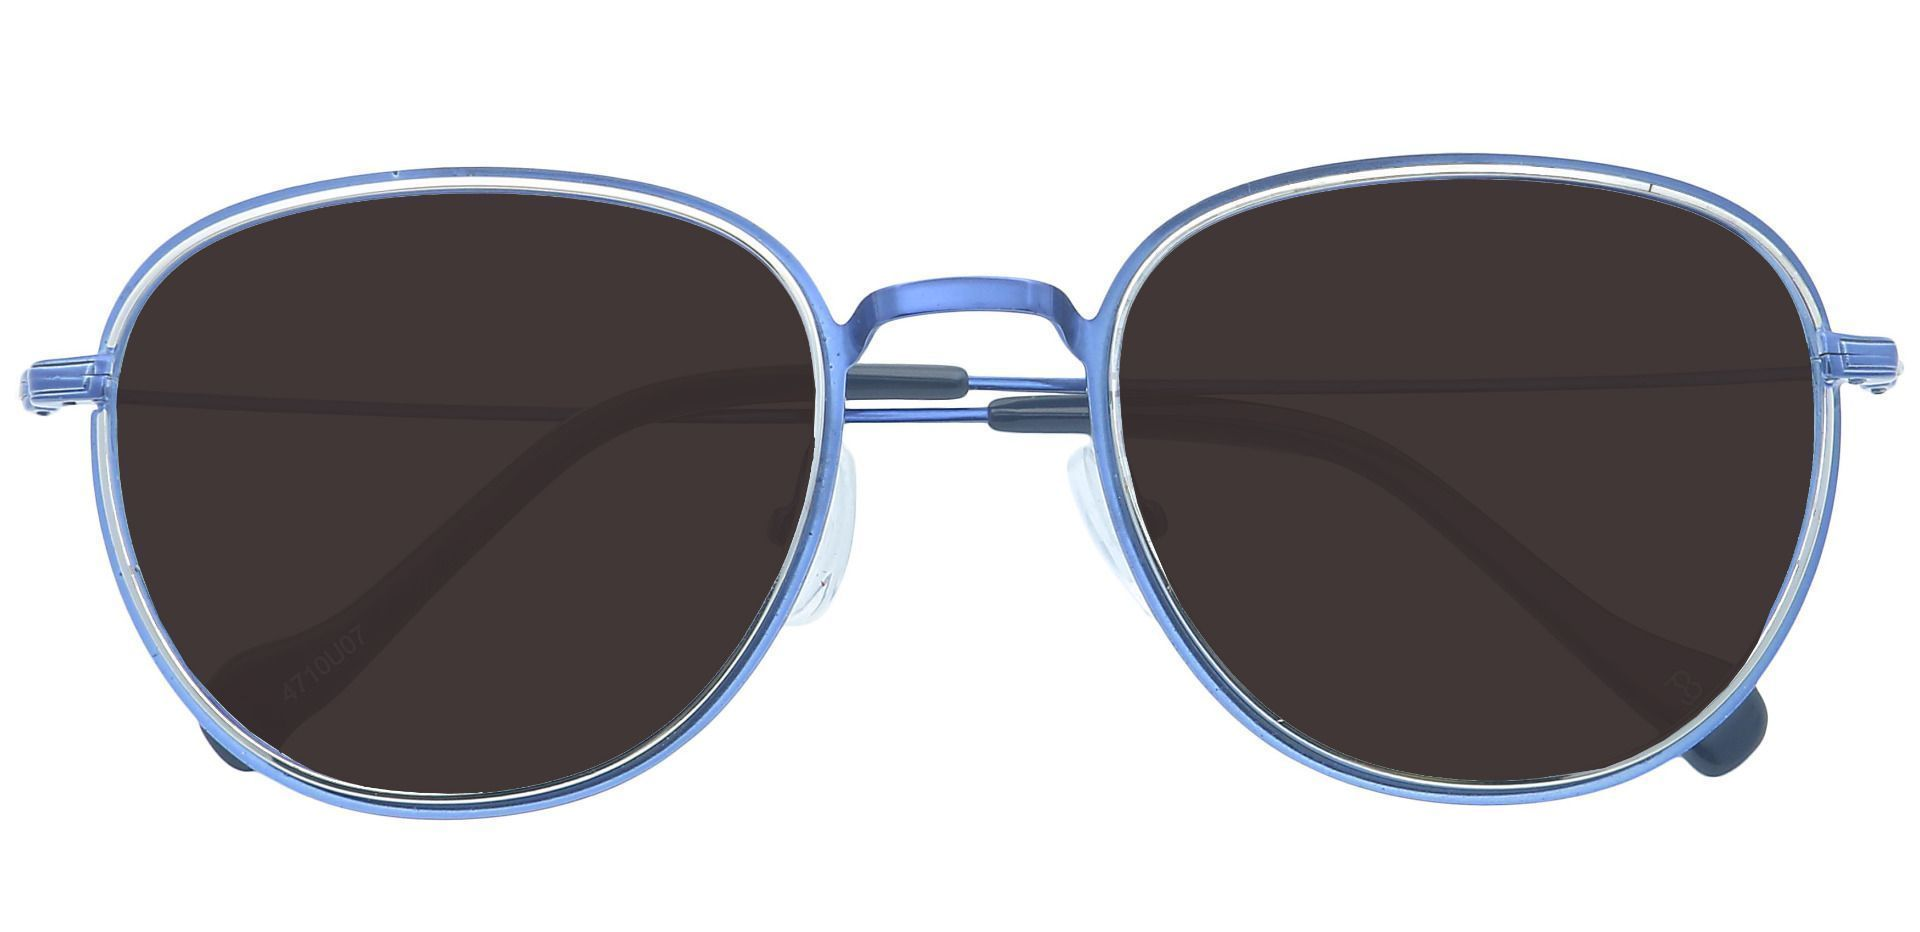 Foster Oval Progressive Sunglasses - Blue Frame With Gray Lenses